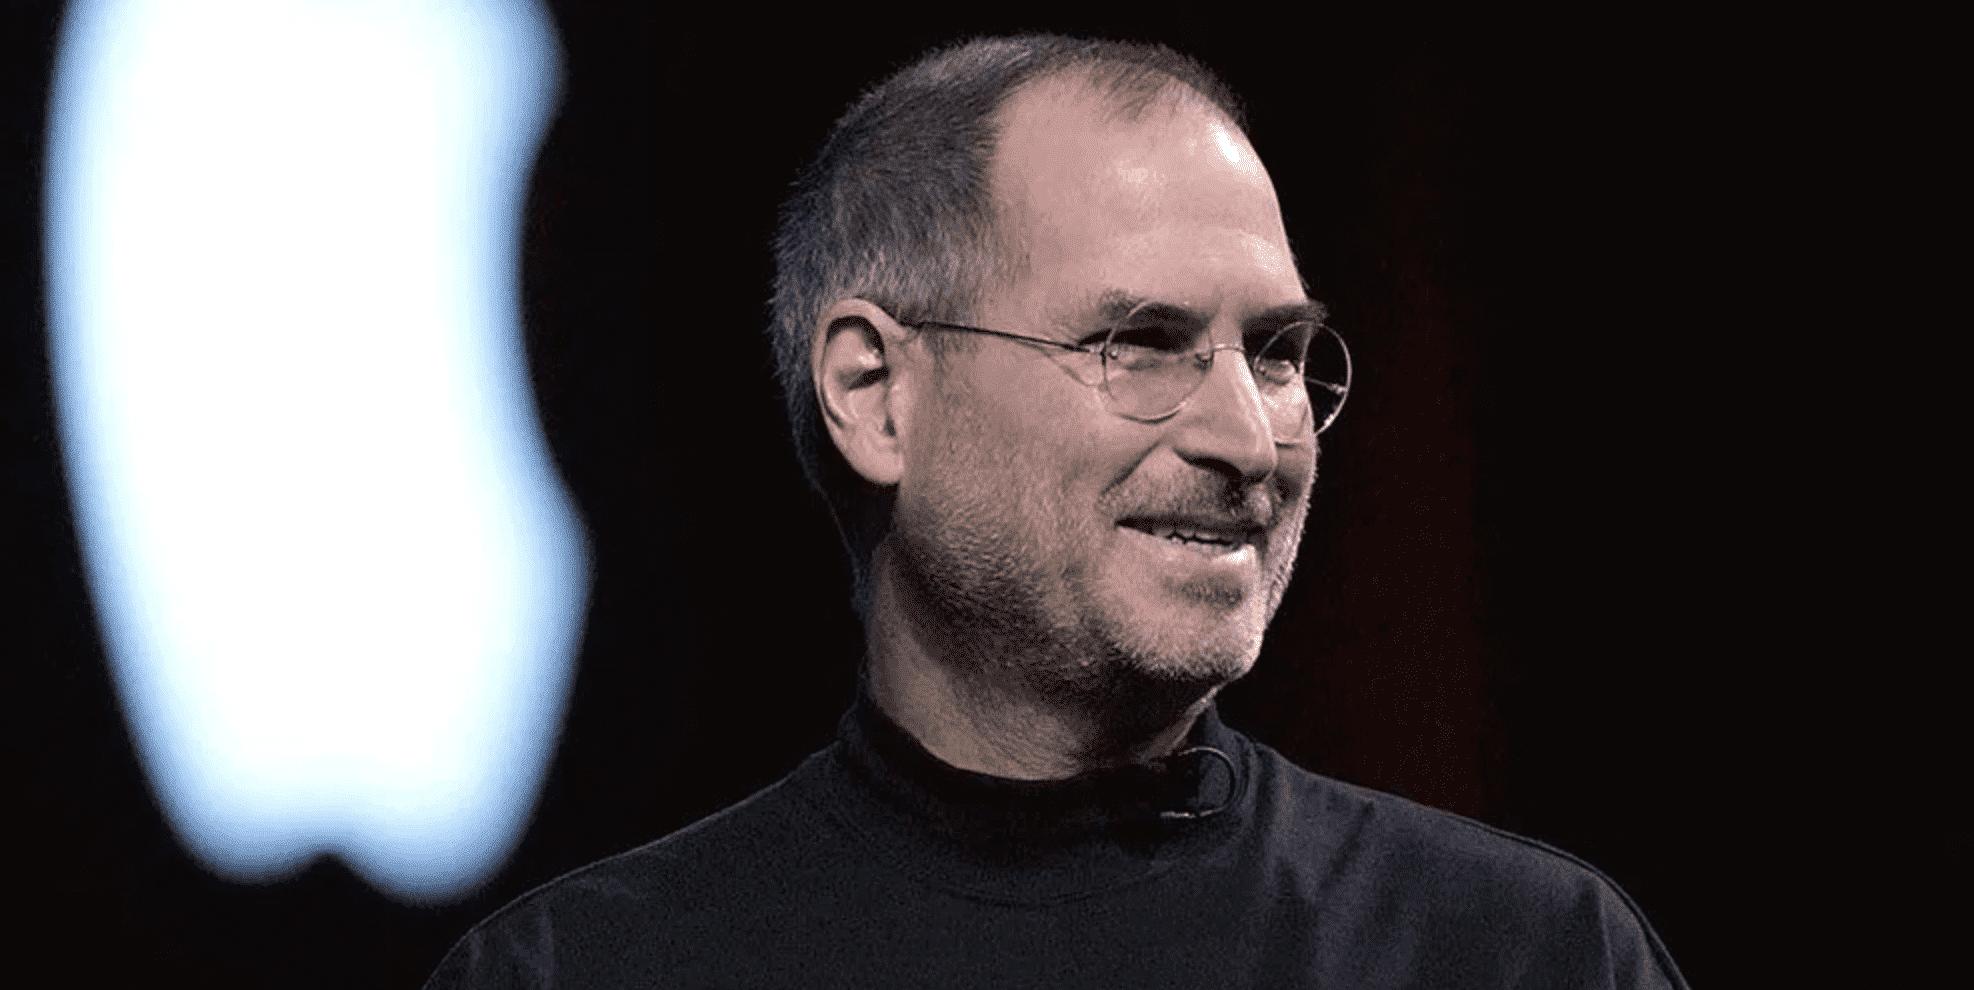 Tim Cook Shares Anniversary Tweet of Steve Jobs